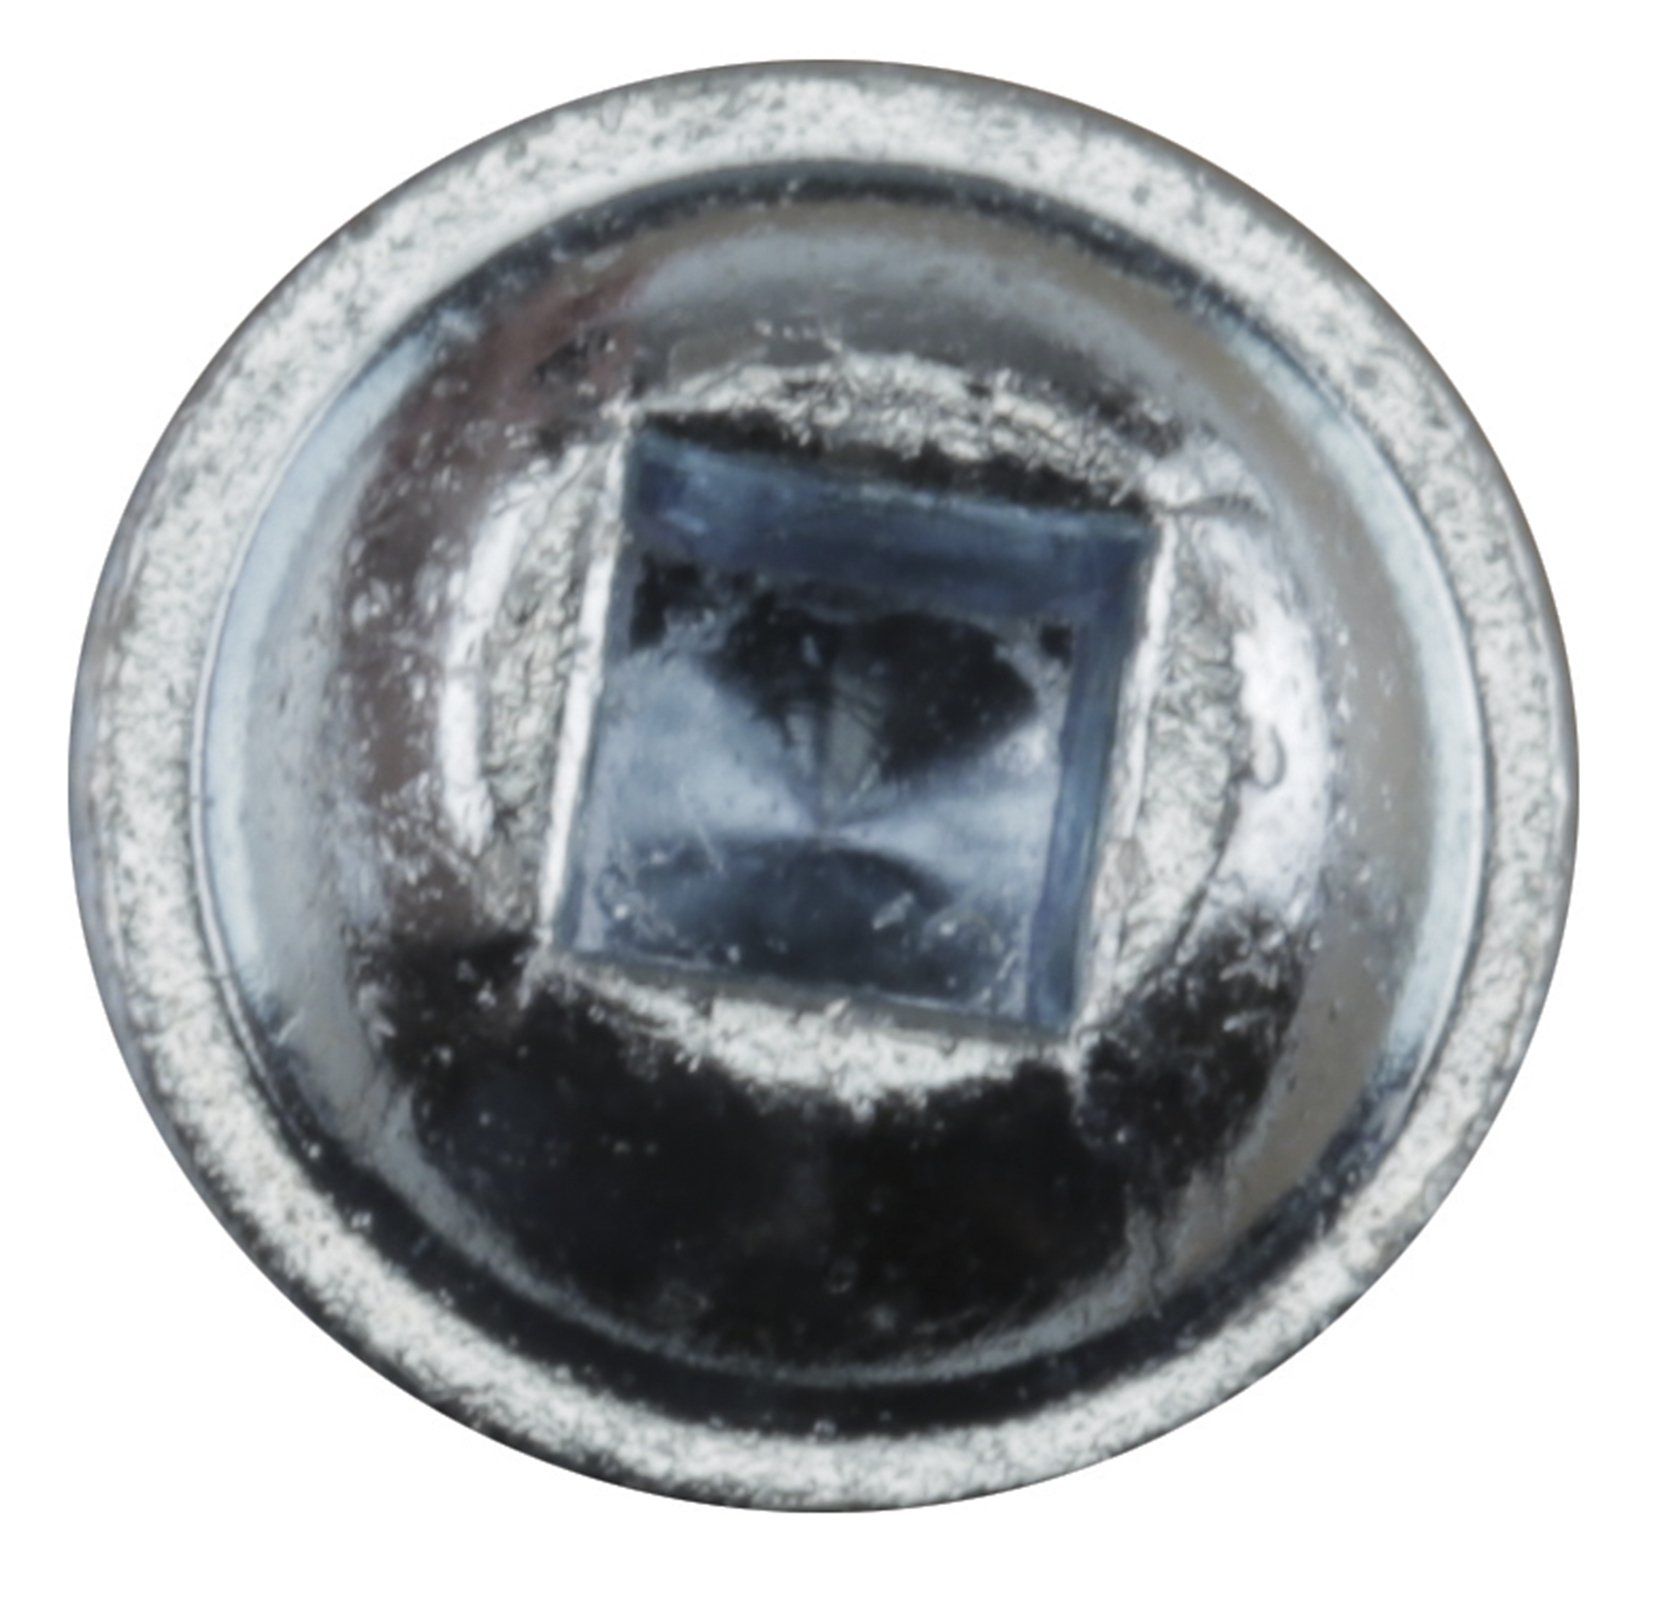 Kreg SML-C1-500 1-Inch #8 Coarse Washer-Head Pocket Hole Screws, 500 Count - SML-C1 - 500 by KREG